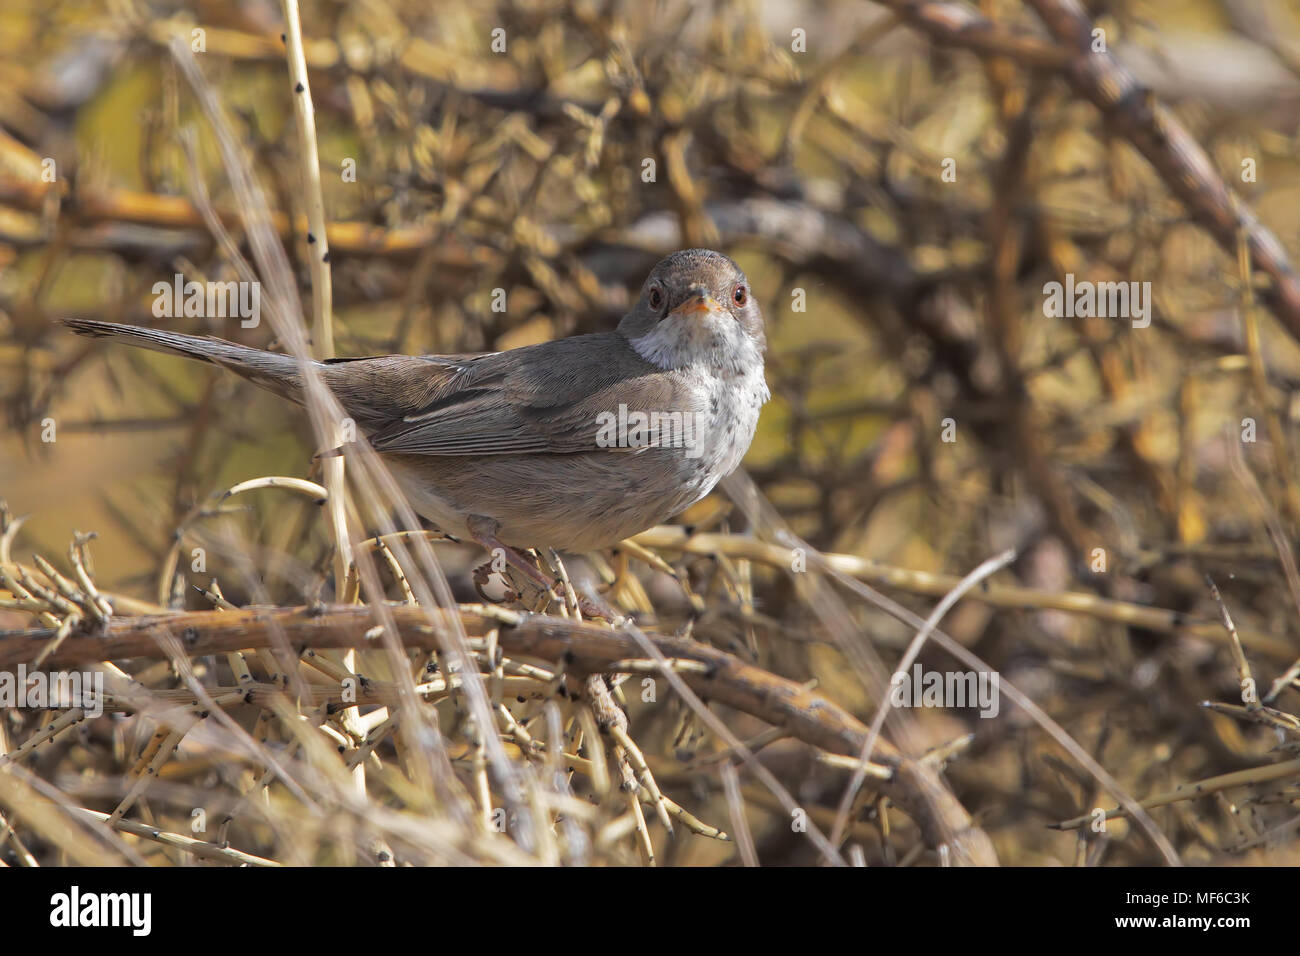 Cyprus warbler - Stock Image